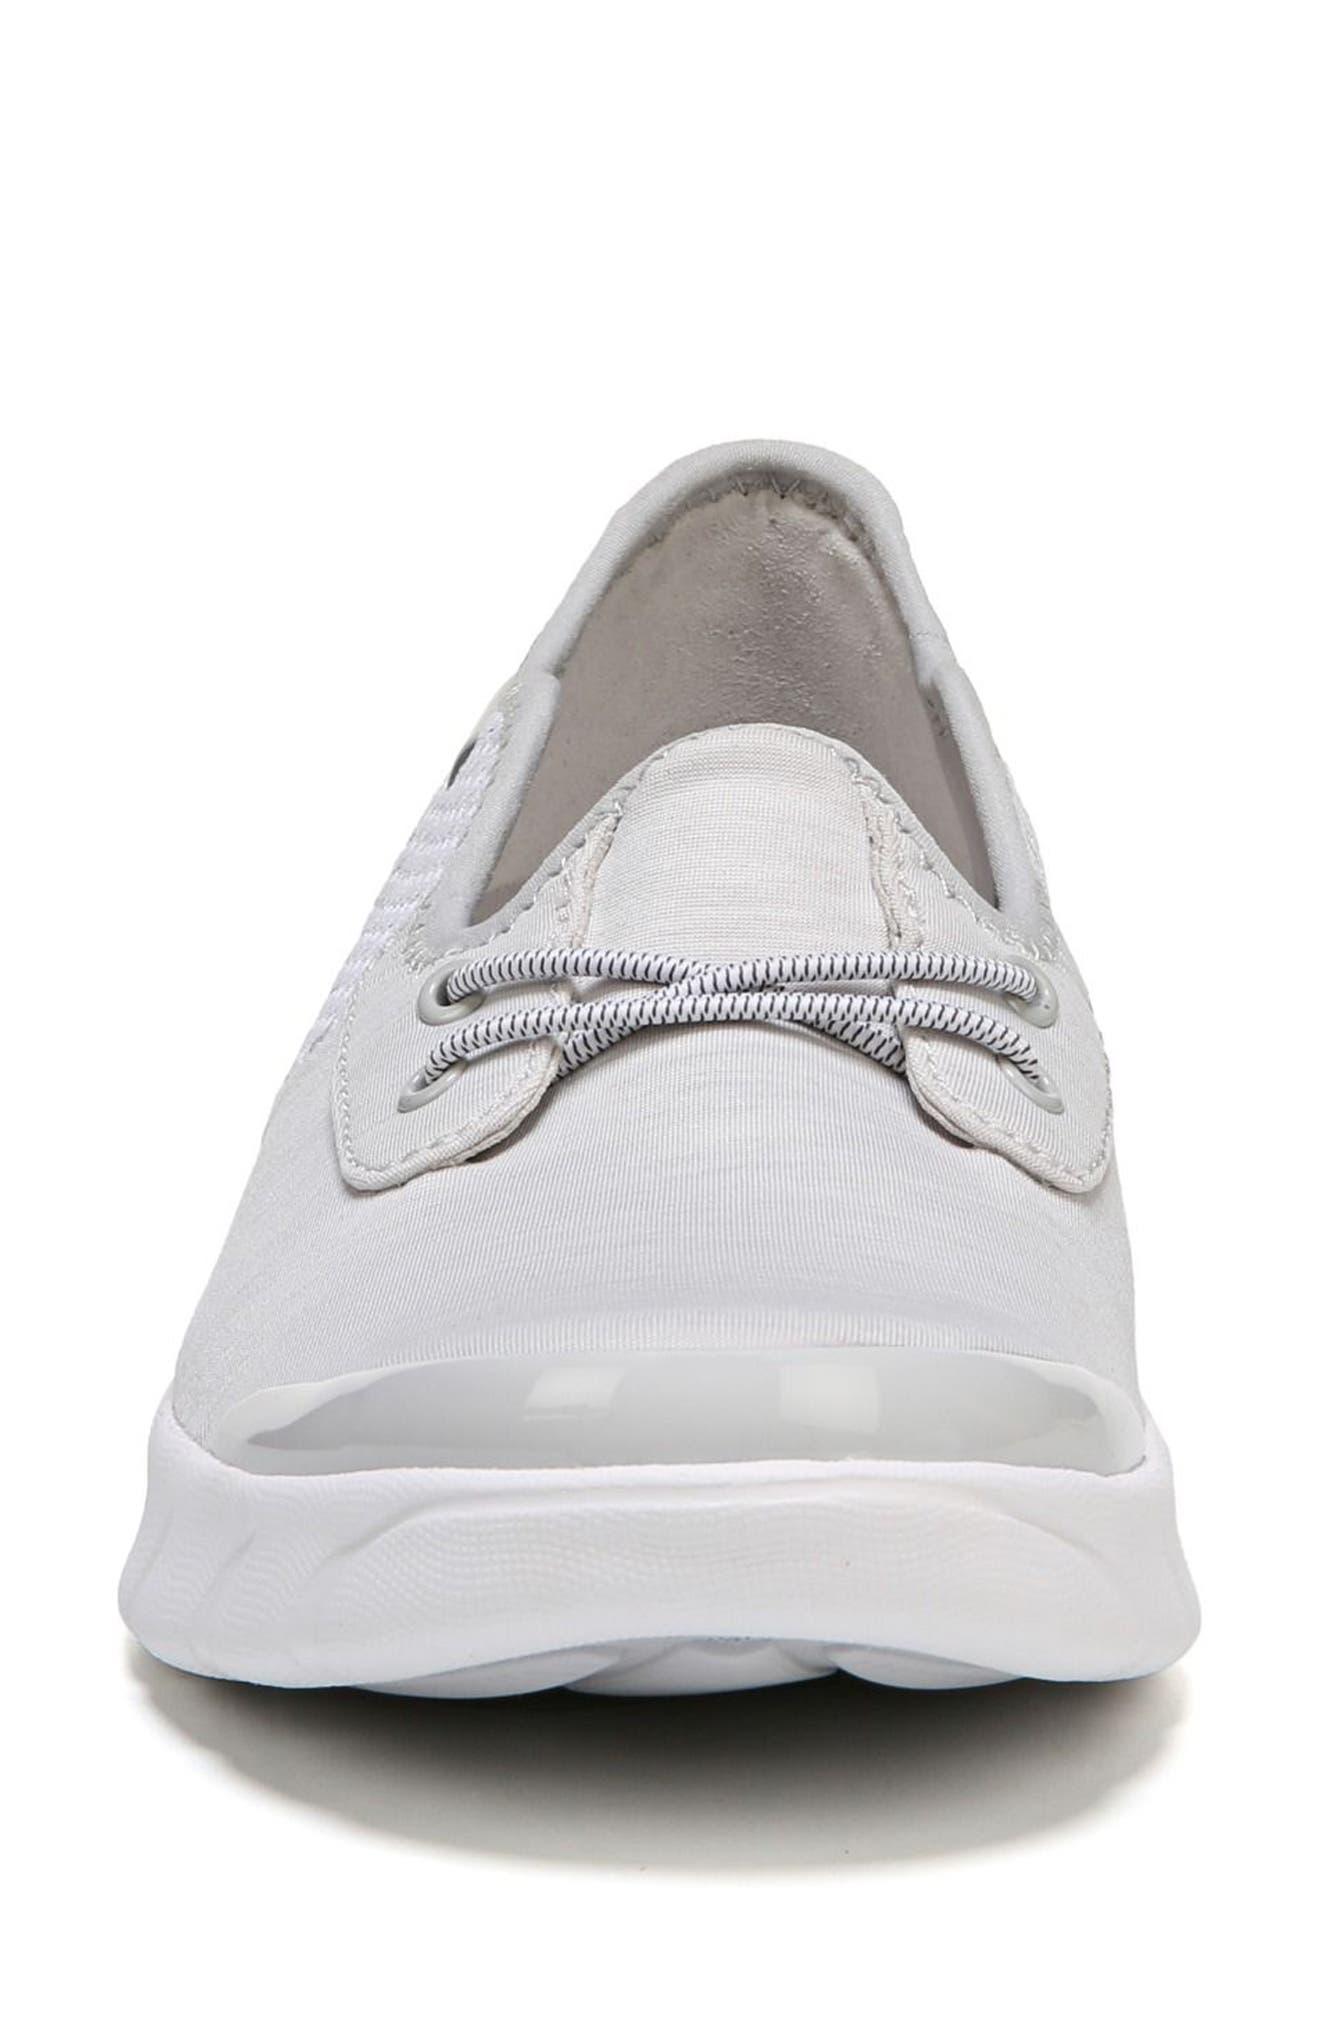 Oz Slip-On Sneaker,                             Alternate thumbnail 4, color,                             Grey Fabric